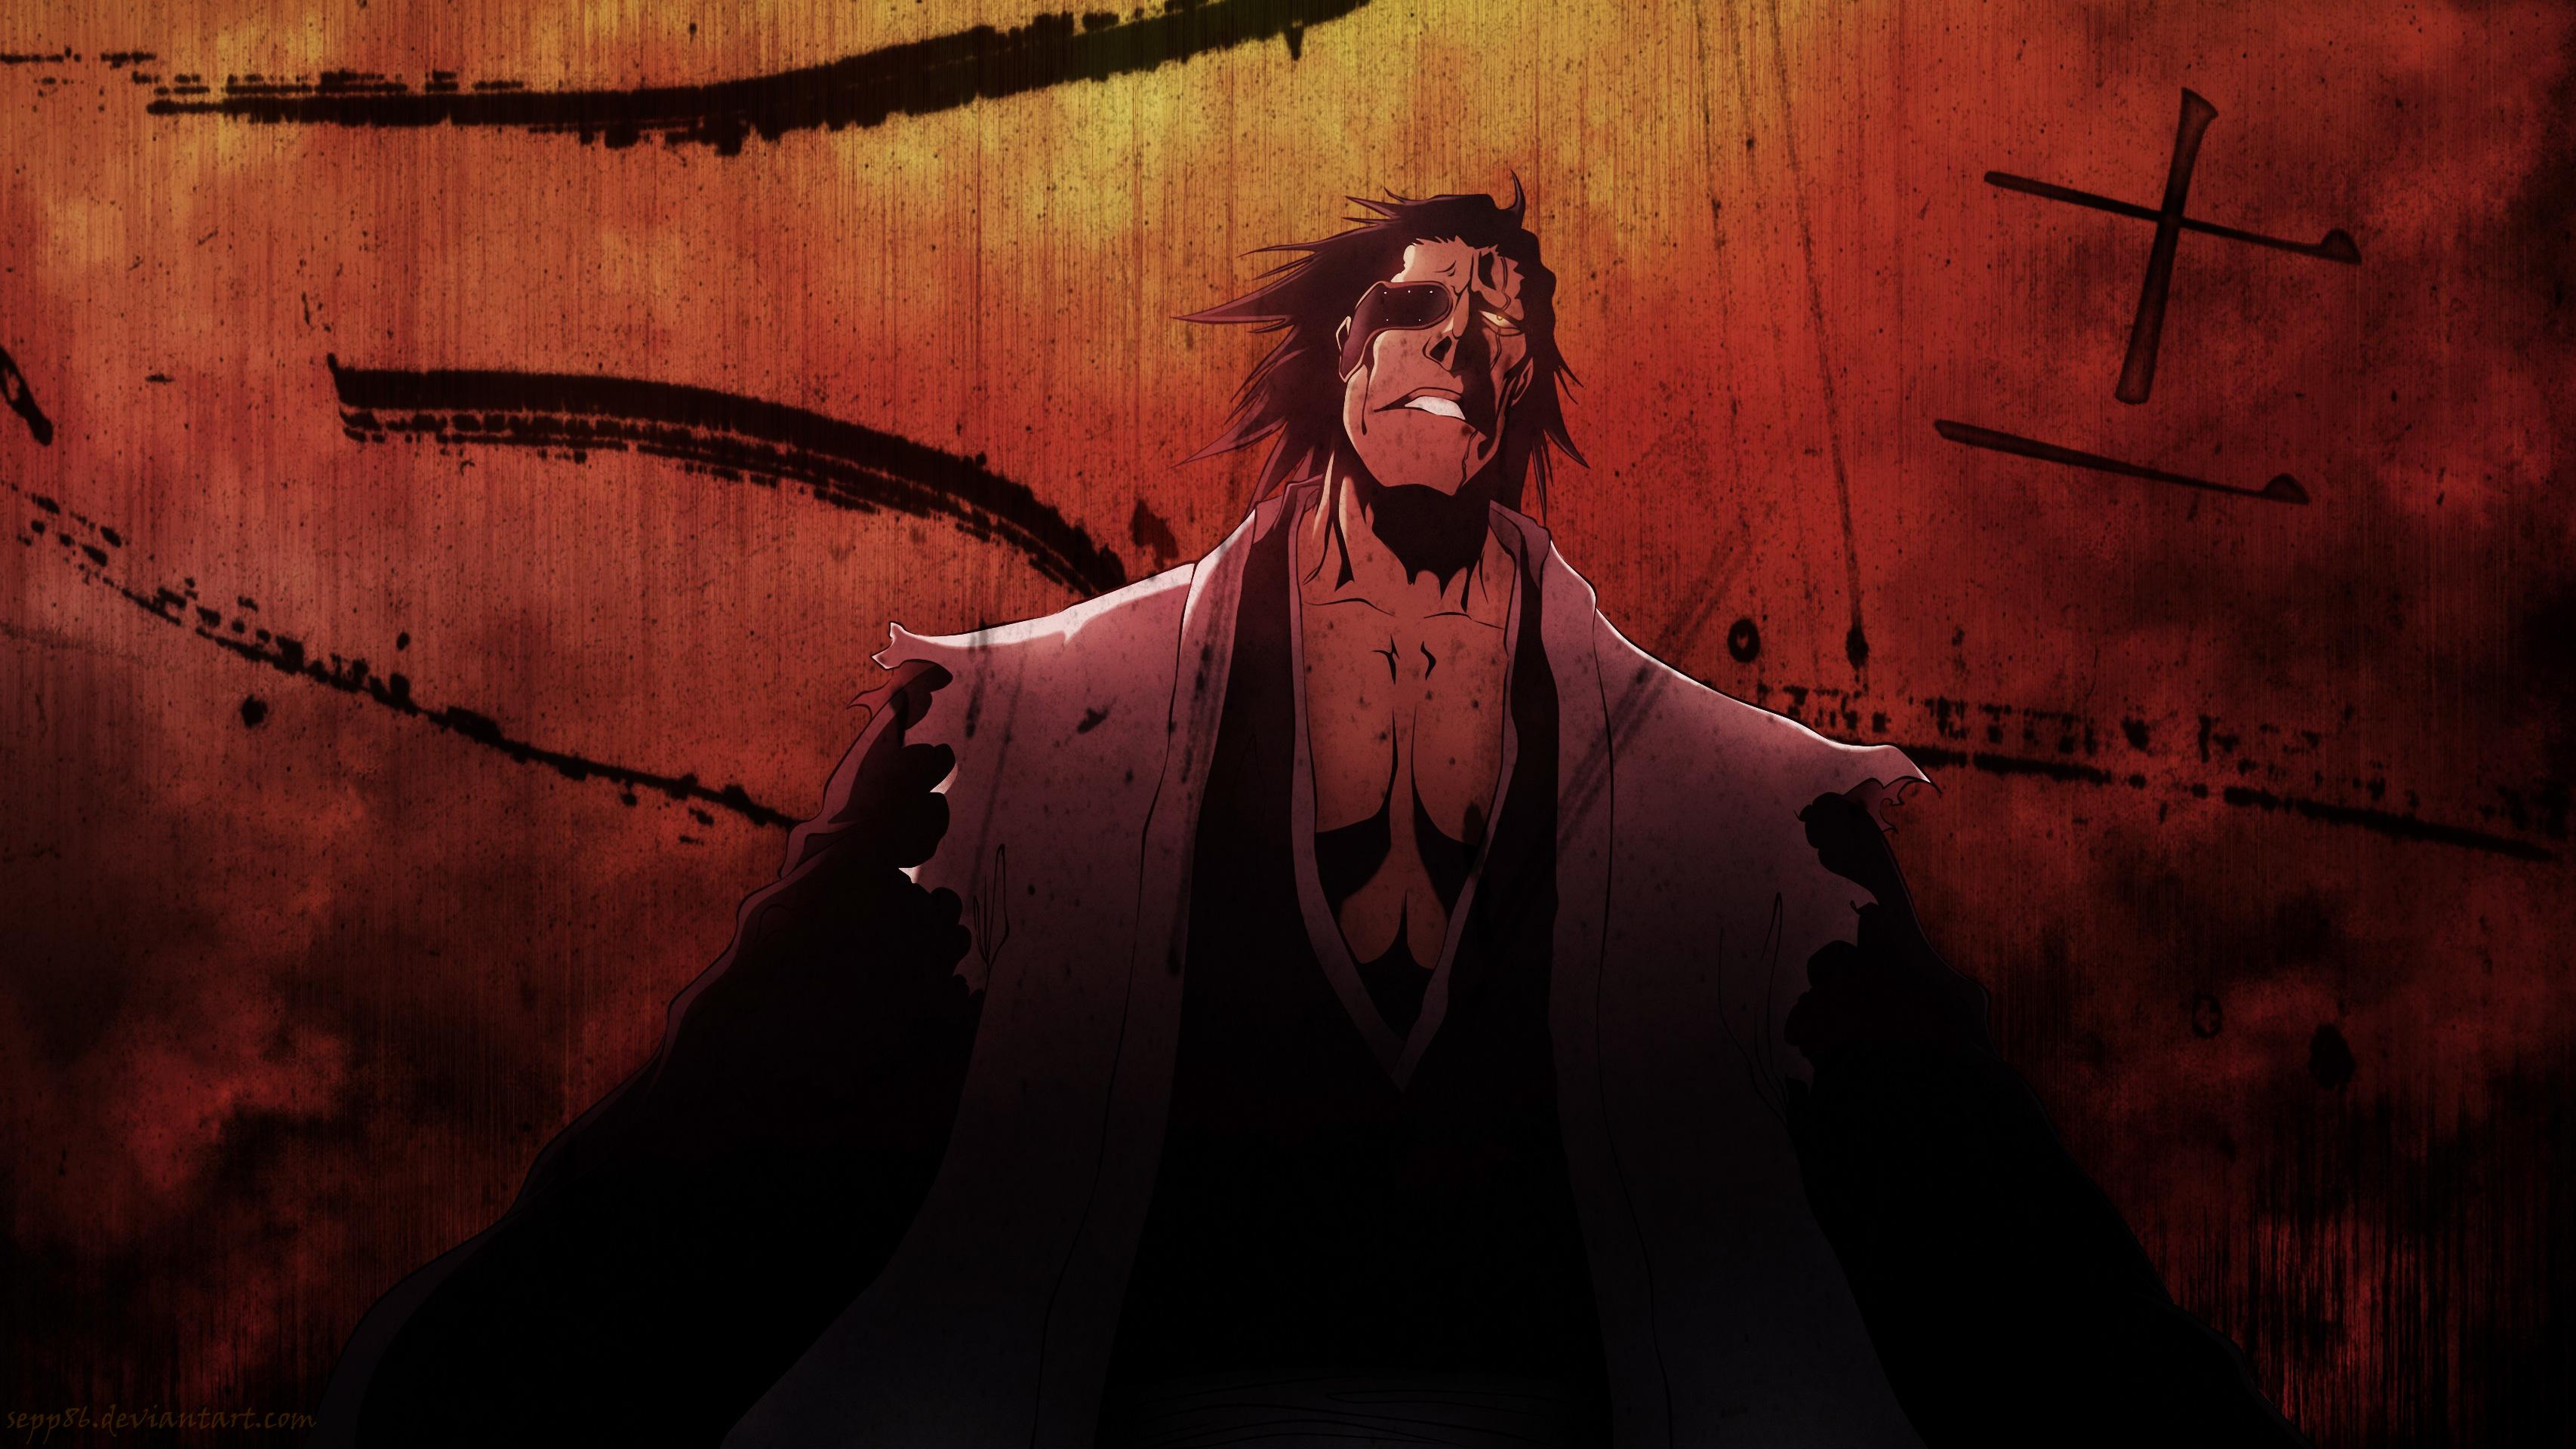 320x480 Animated Wallpapers Anime Bleach Kenpachi Zaraki Hd Anime 4k Wallpapers